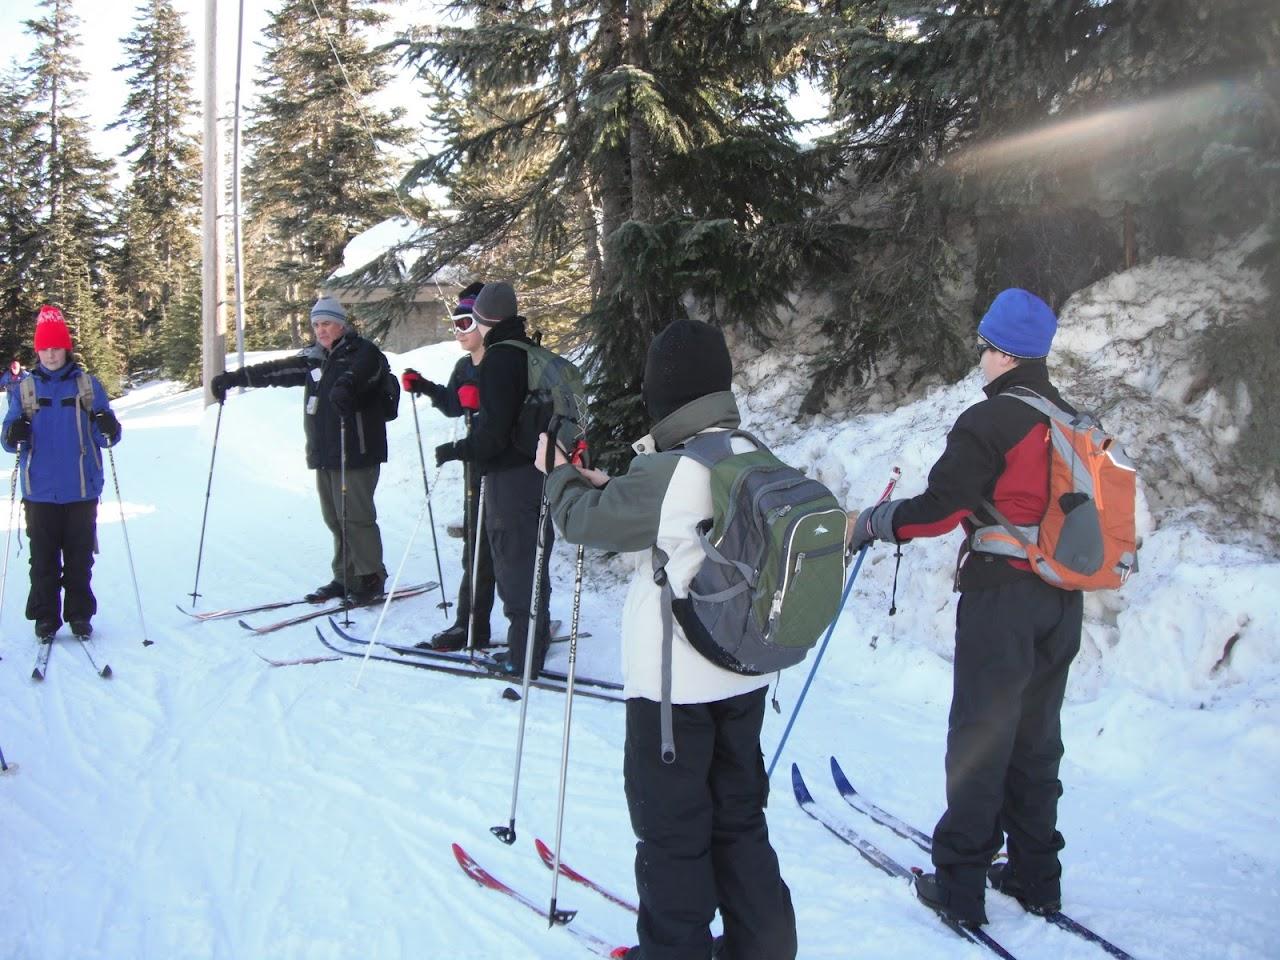 Cross Country Skiing - DSCF1533.JPG